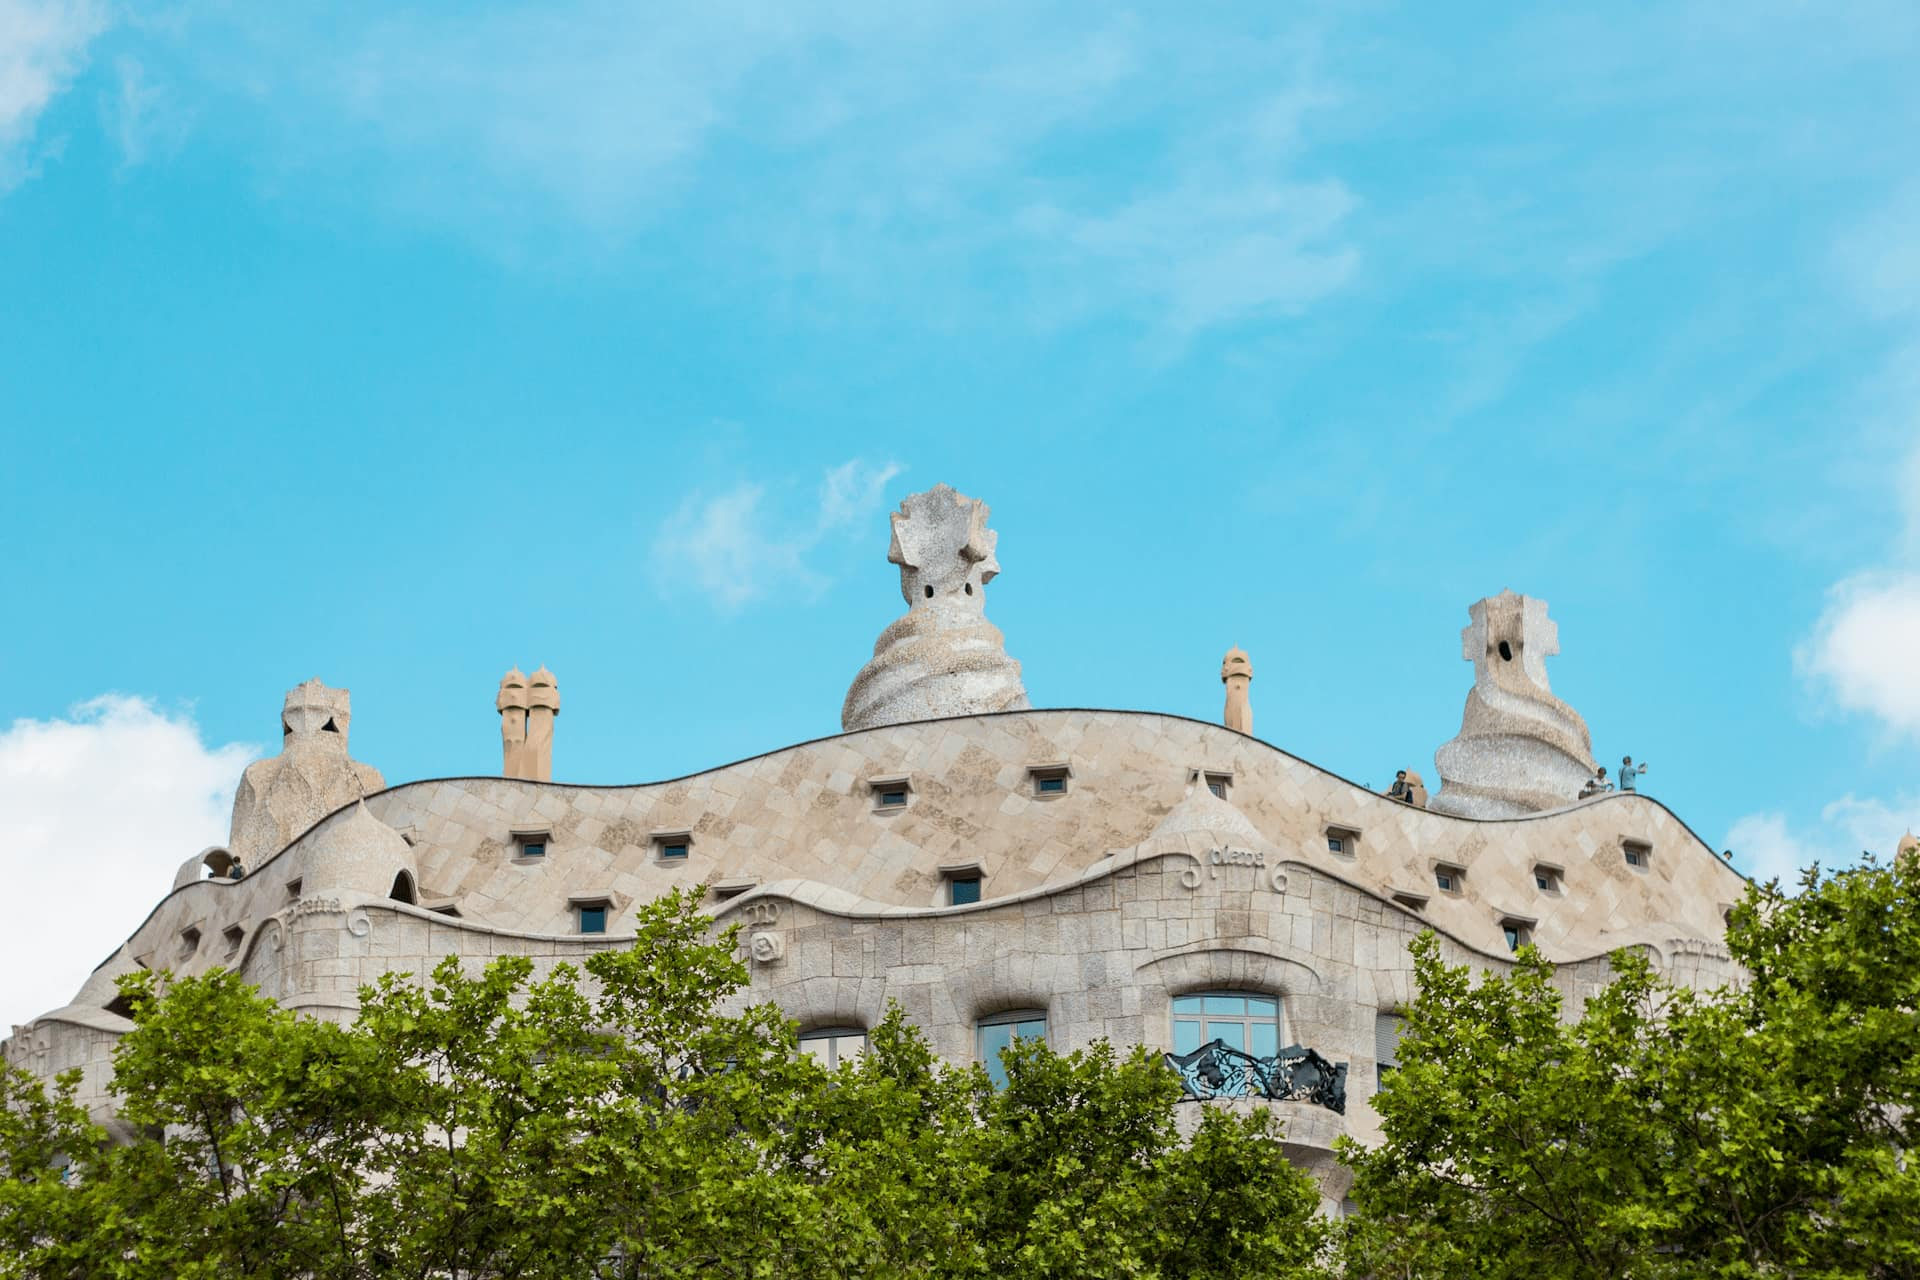 24 horas para descubrir L'Eixample de Barcelona